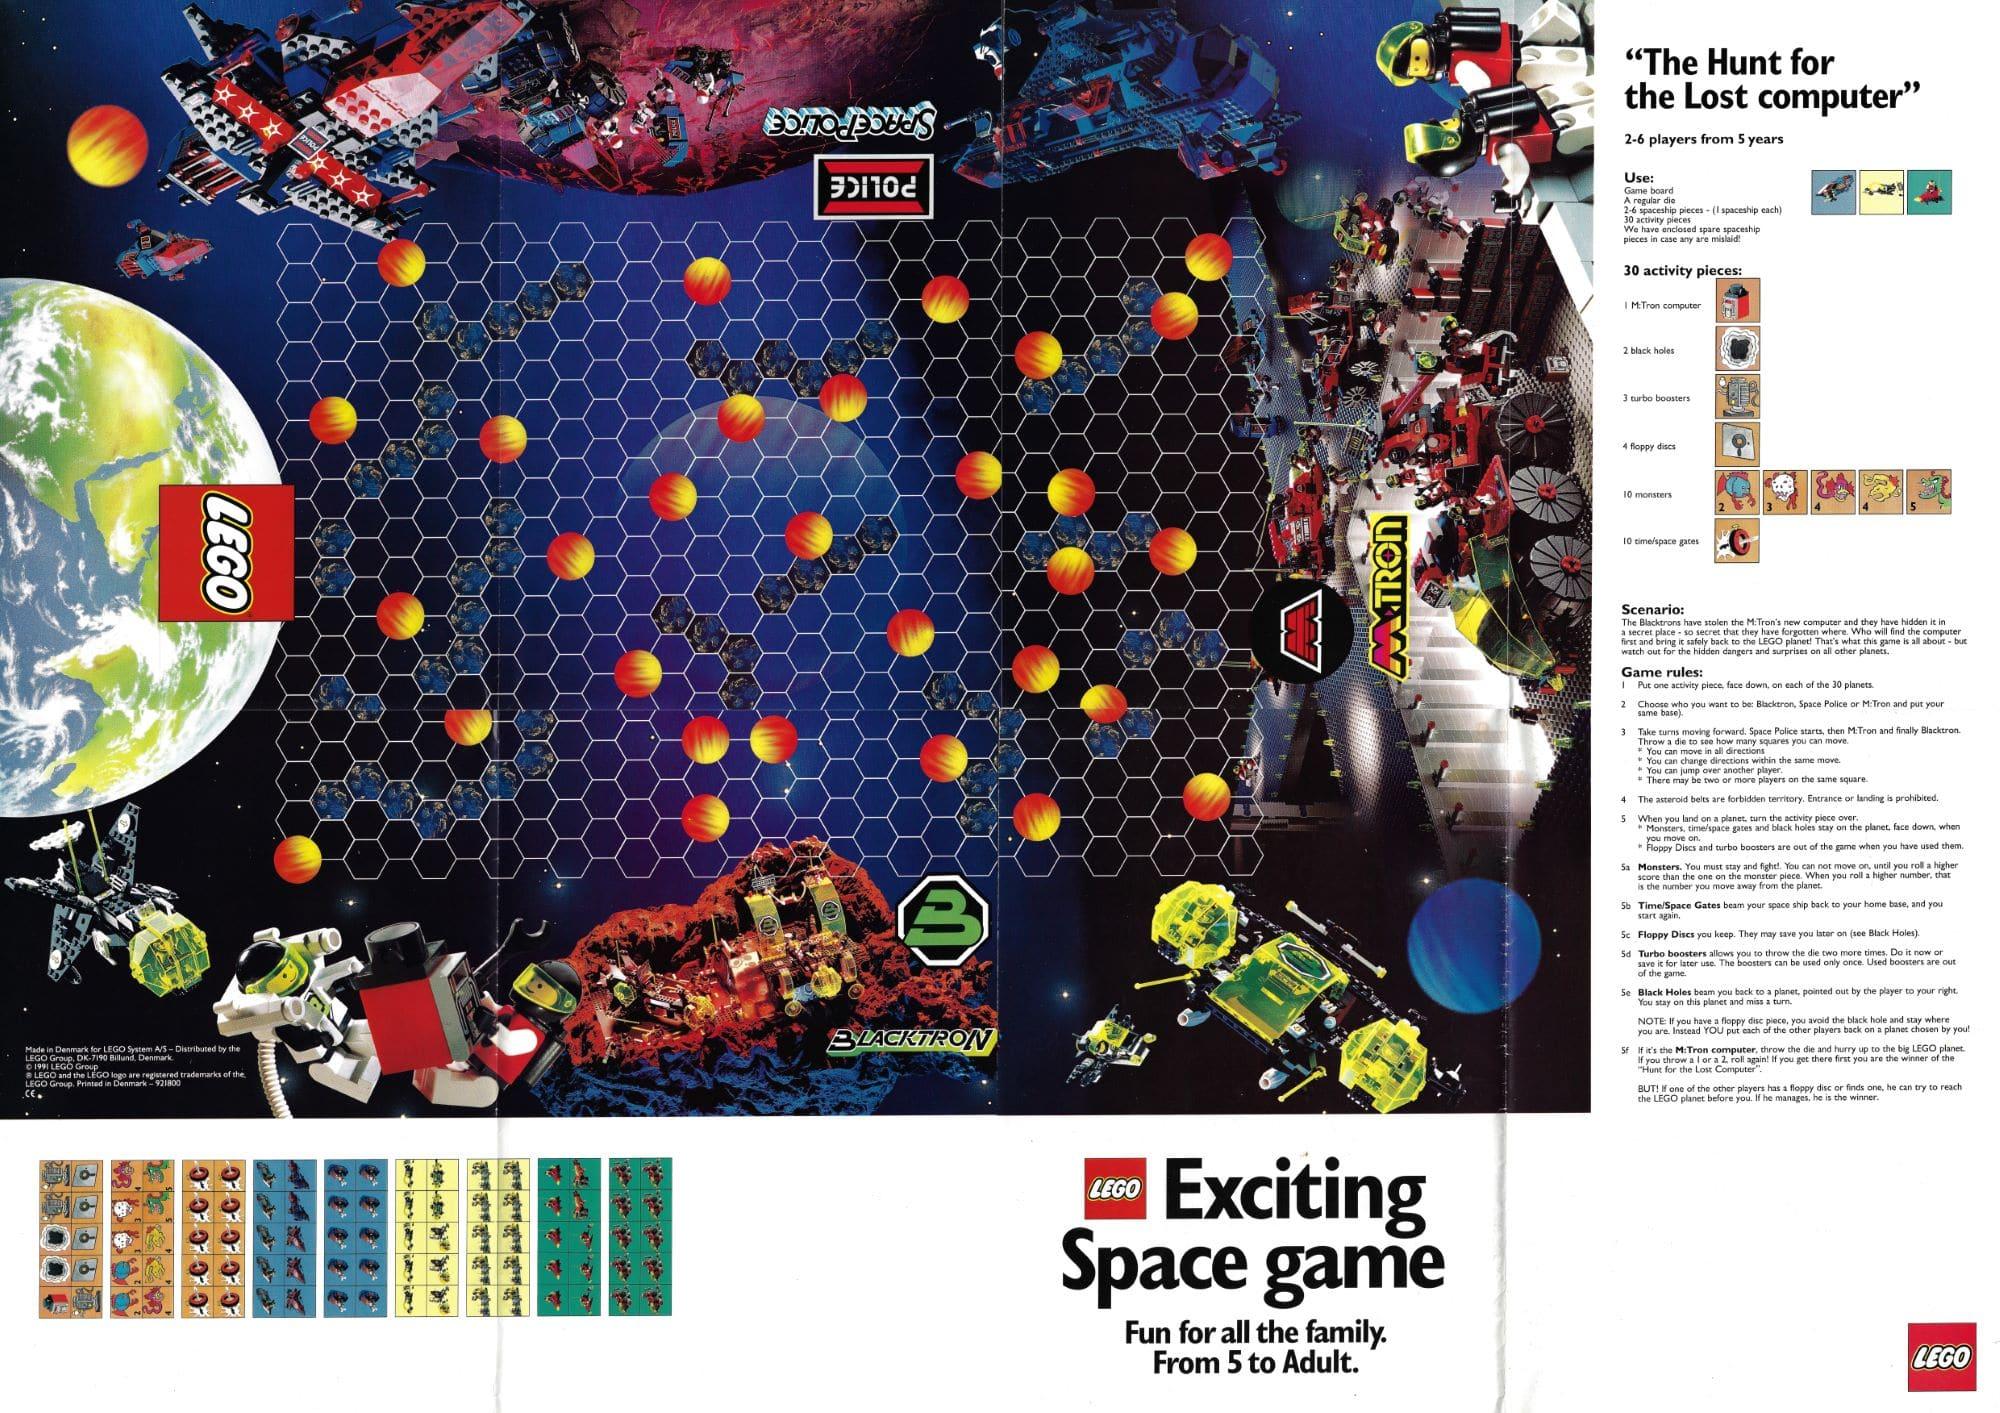 LEGO M Tron Blacktron Space Police Space Game